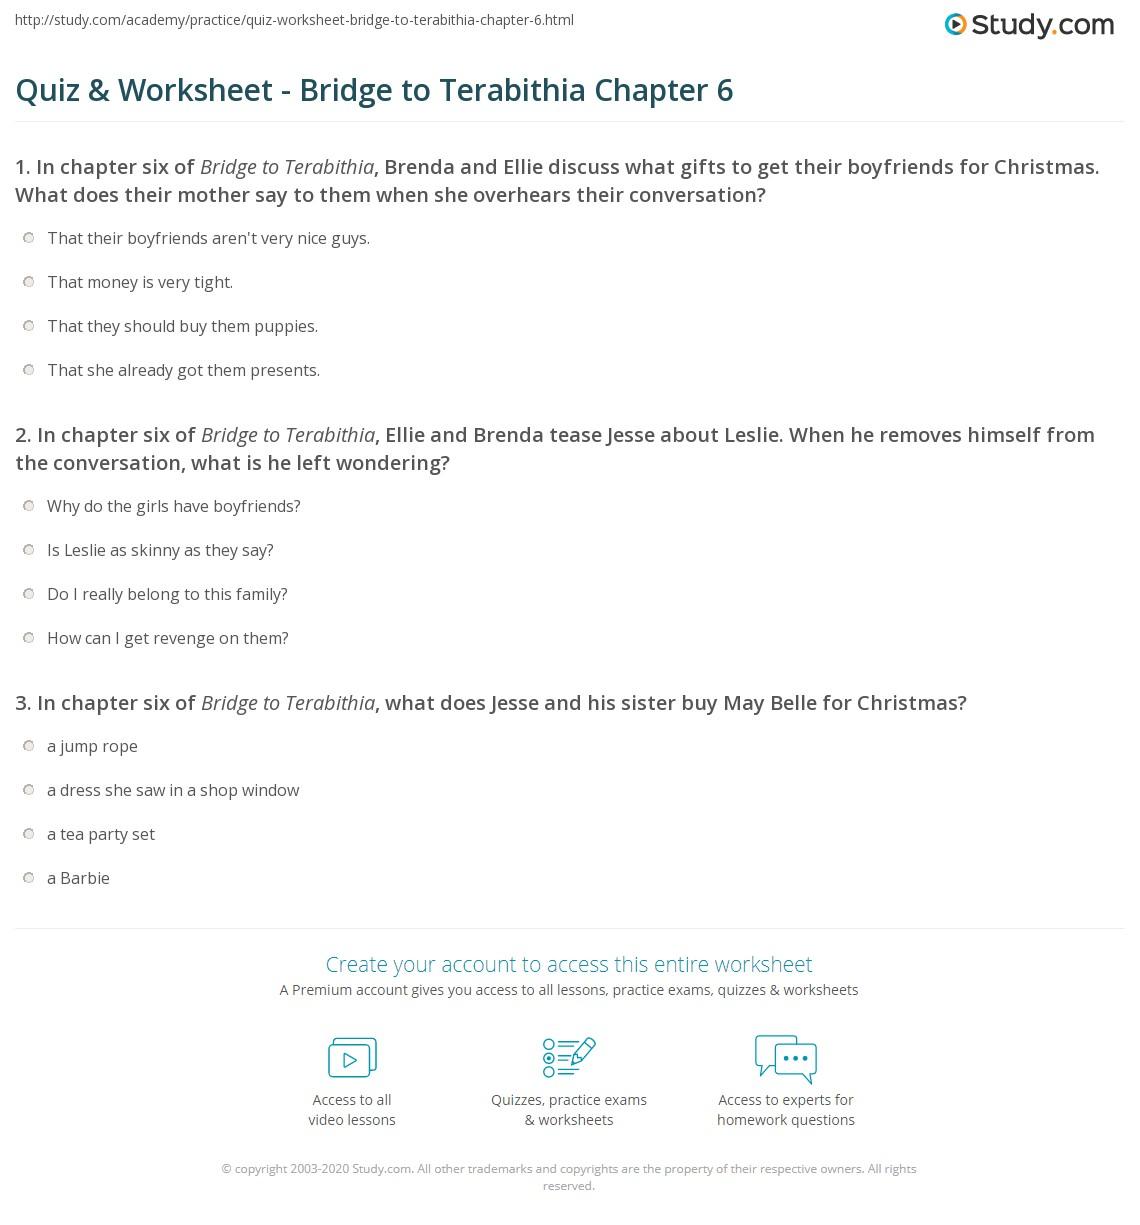 Quiz & Worksheet - Bridge to Terabithia Chapter 6   Study.com